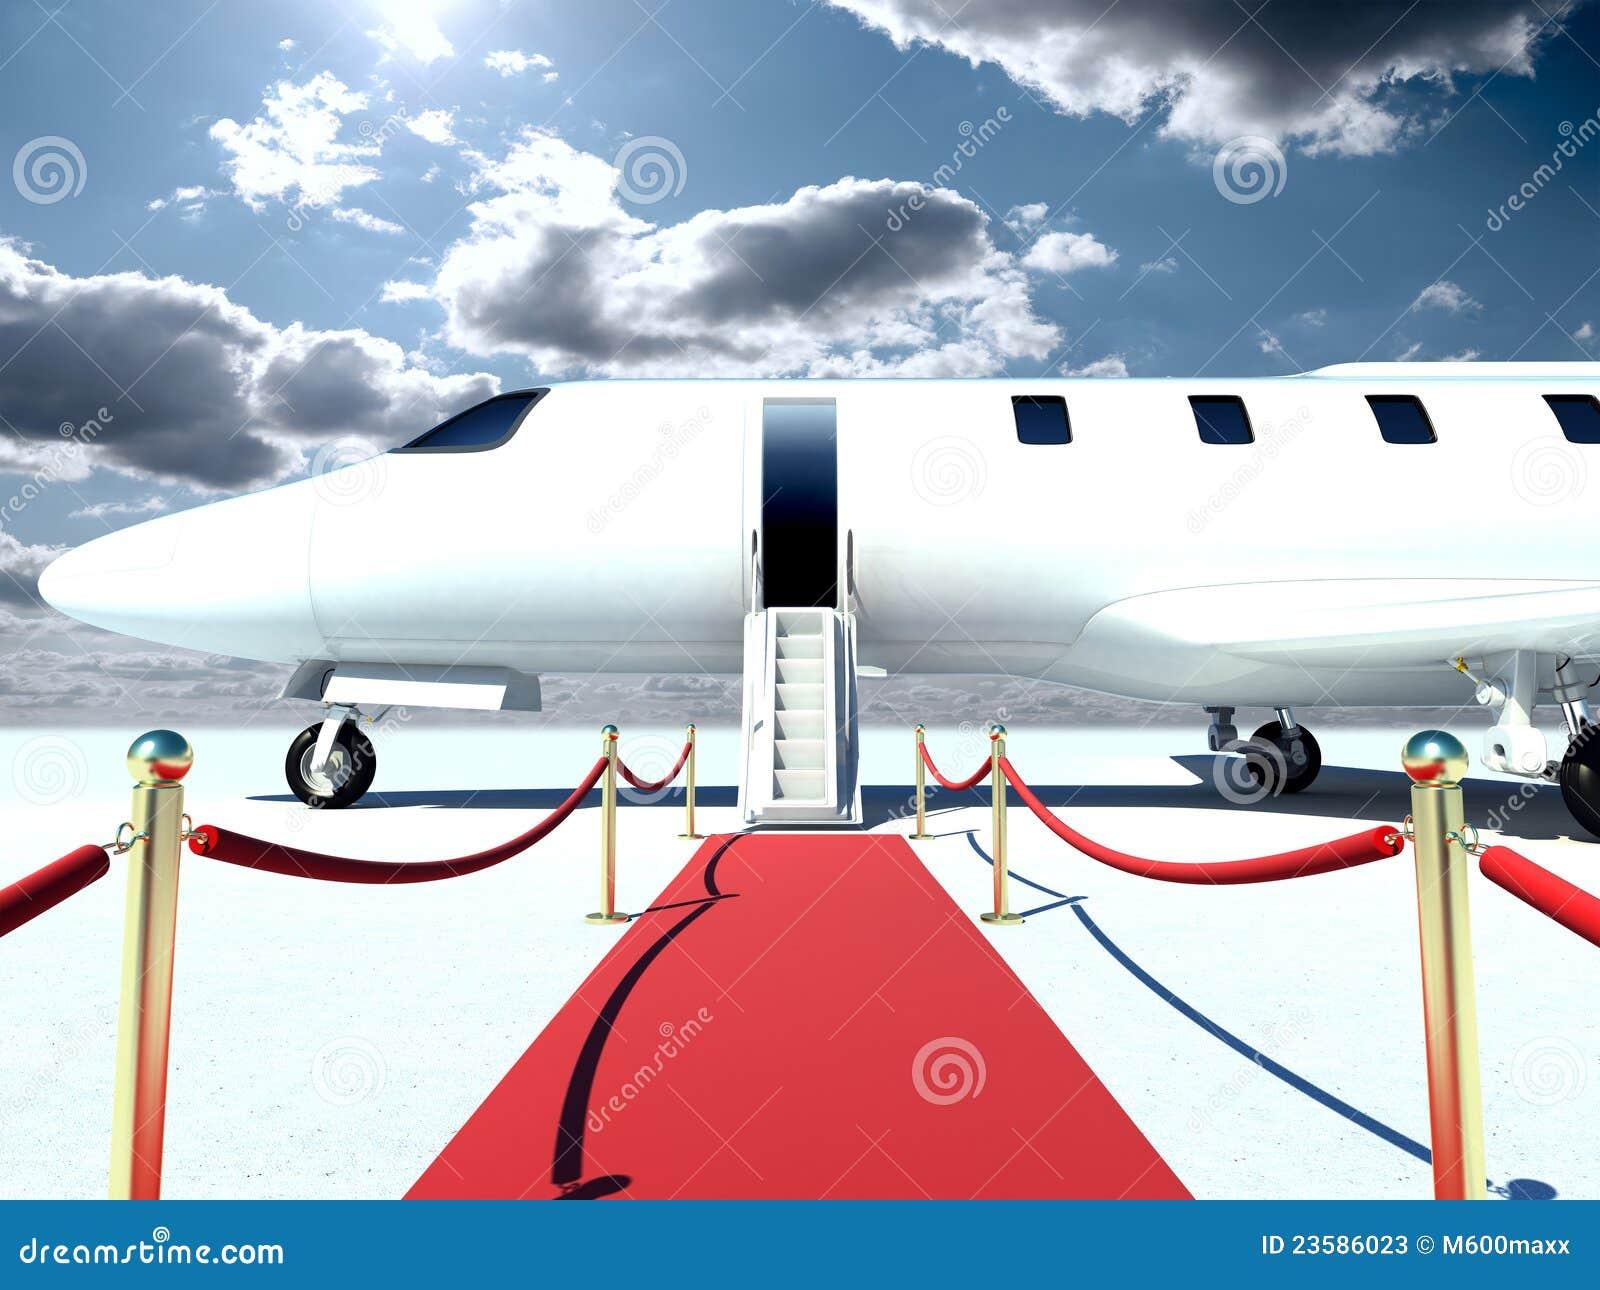 Jet Plane Stock Photos  Image 23586023